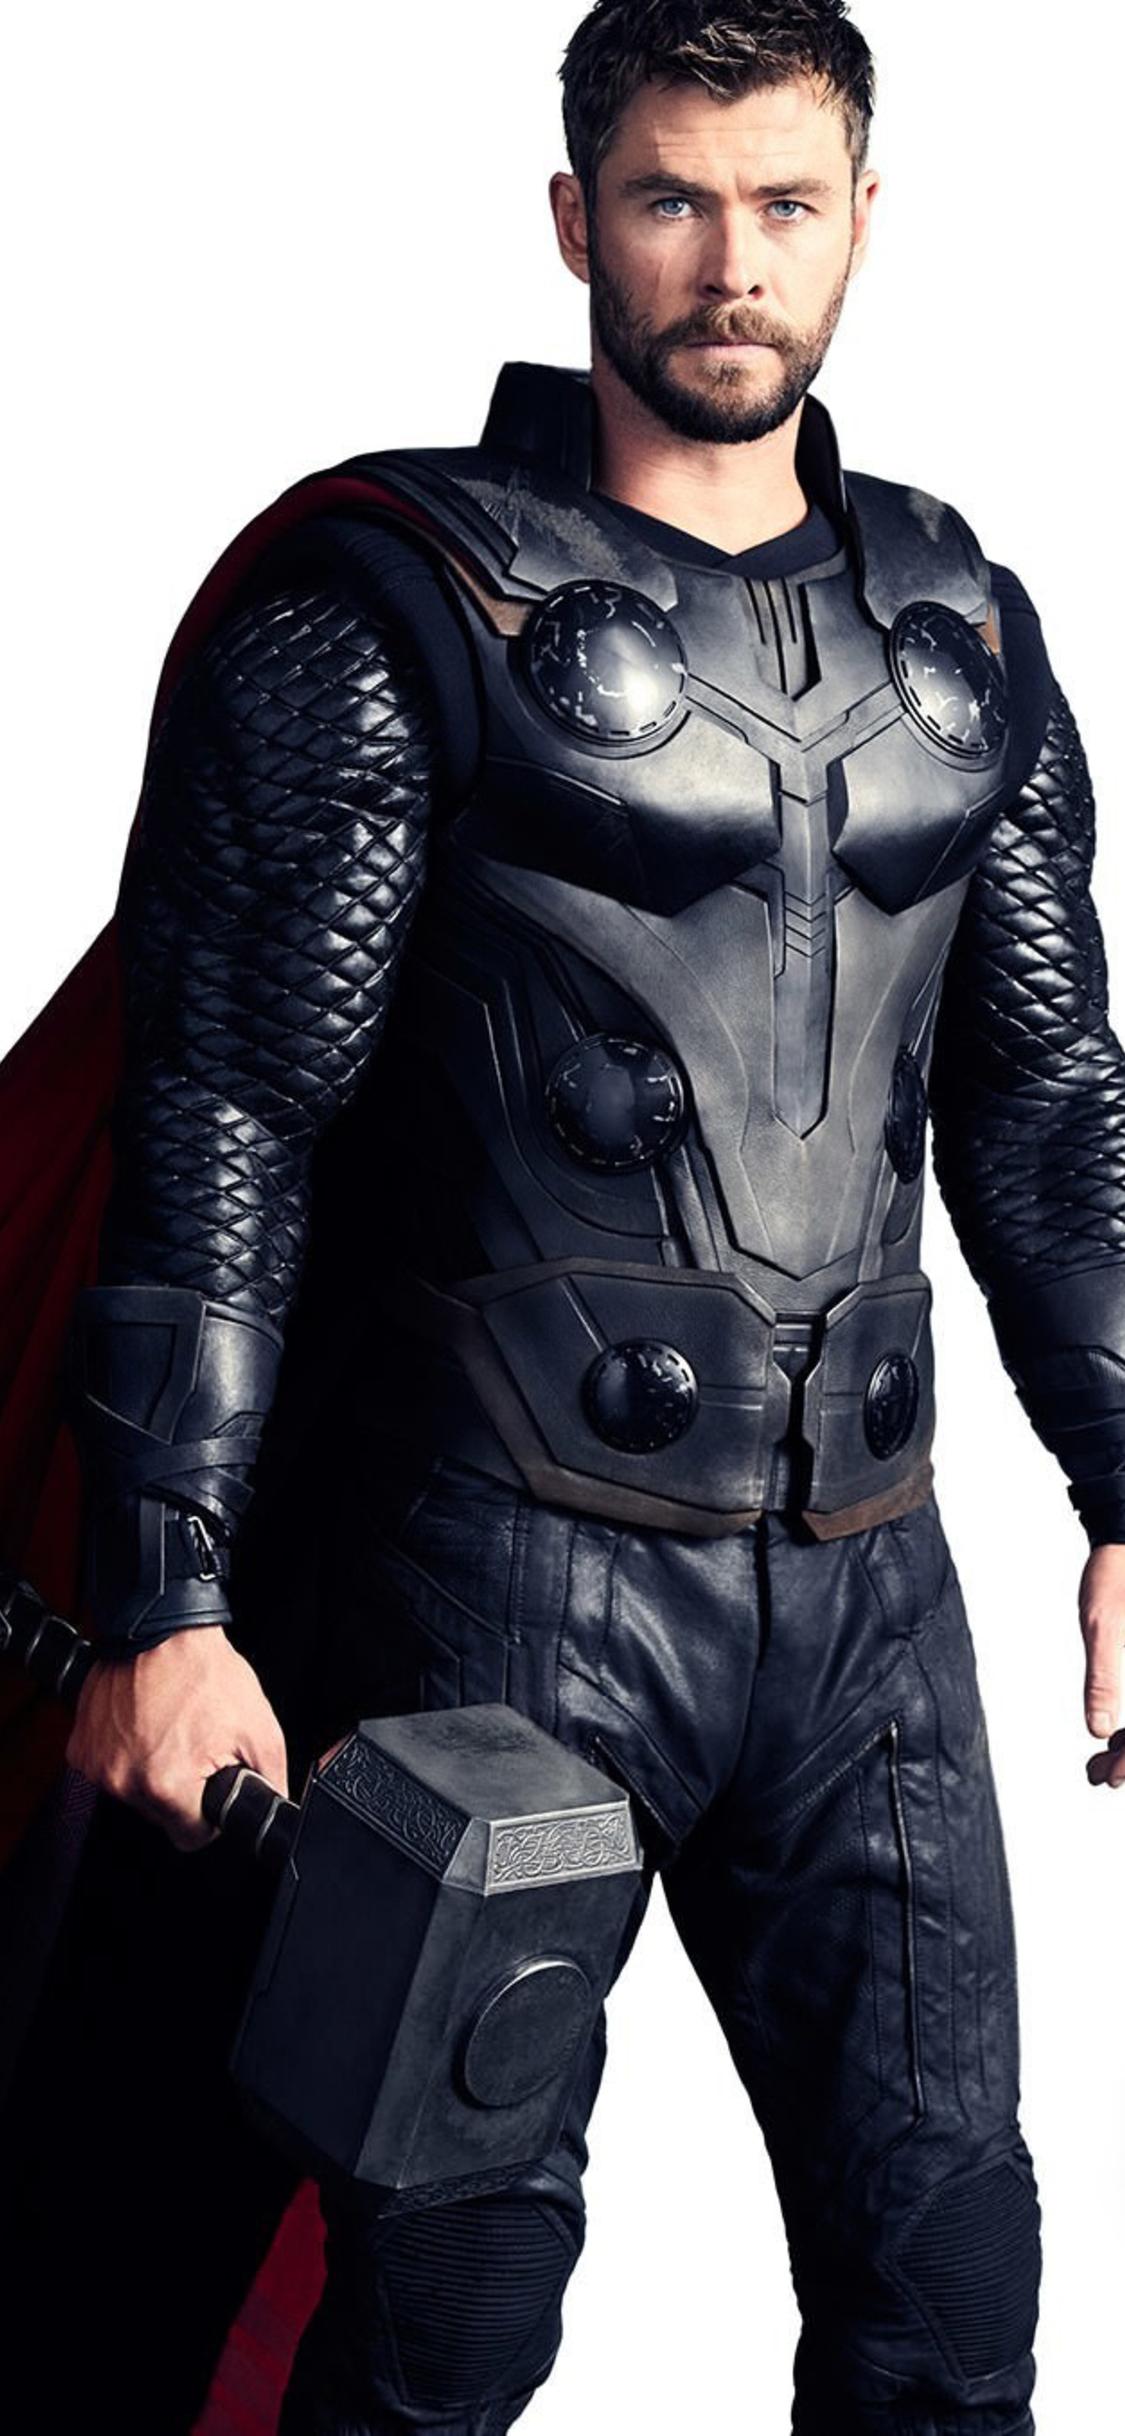 Thor In Avengers Infinity War 2018 - Thor Avengers Infinity War Costume , HD Wallpaper & Backgrounds